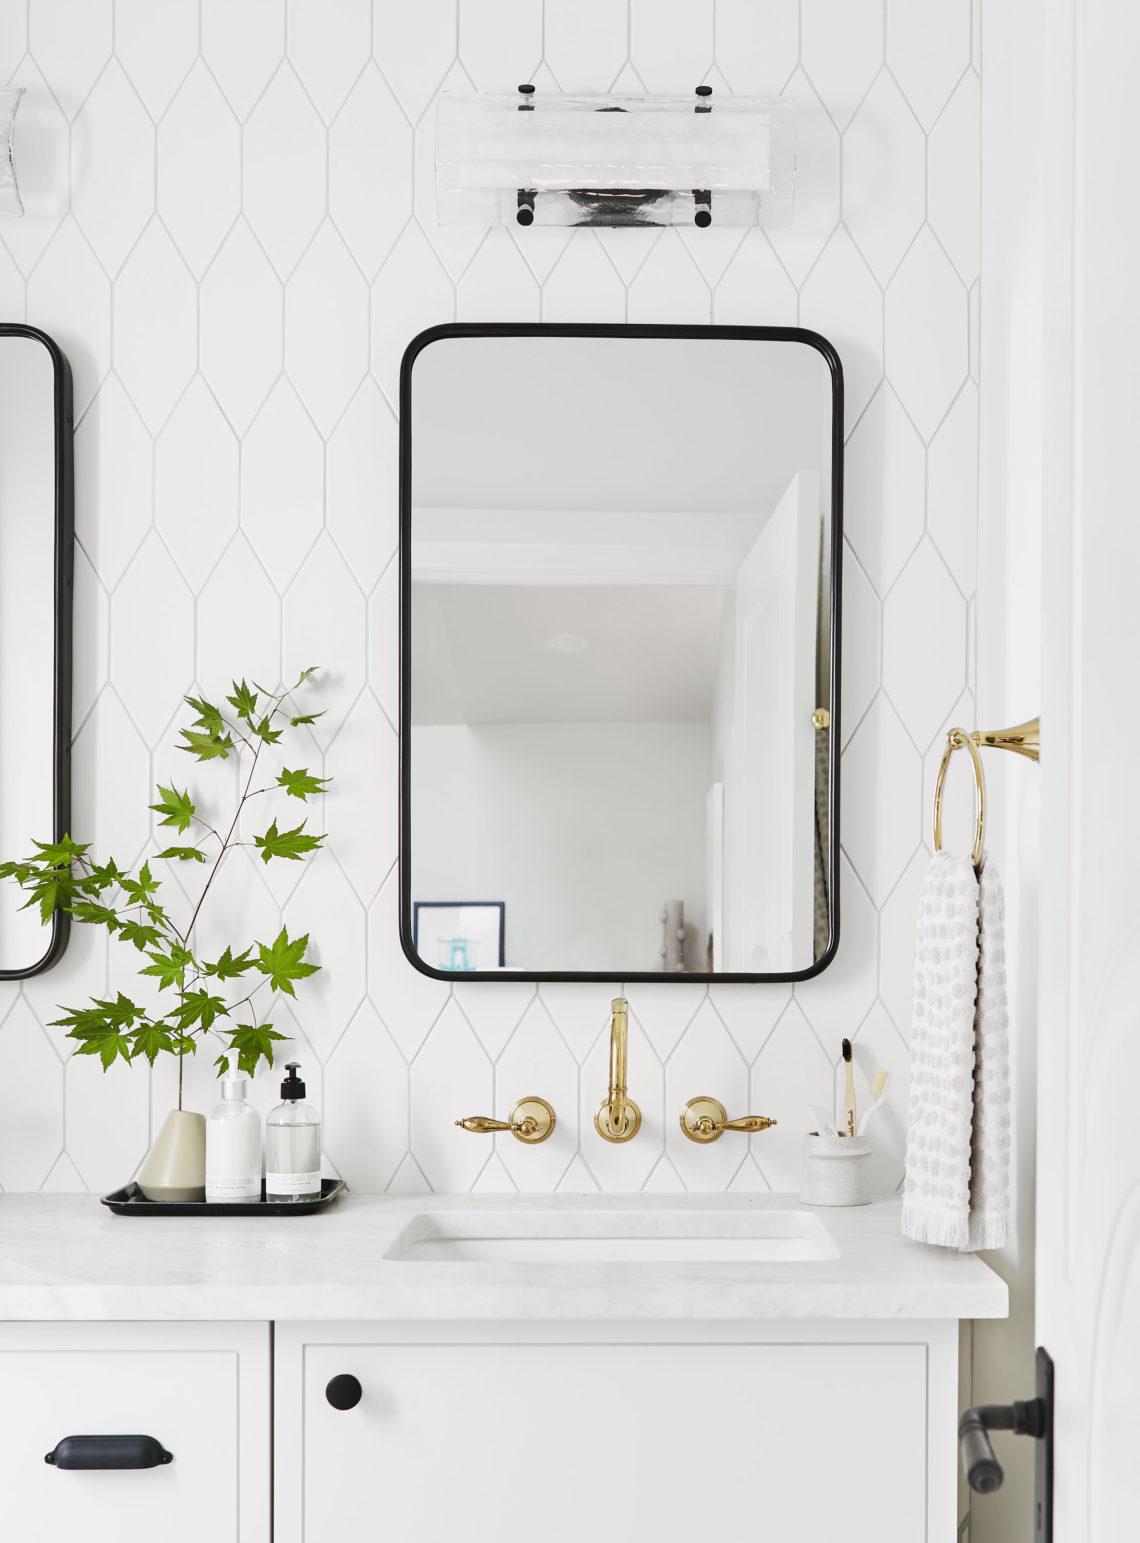 10 Best Interior Design Blogs to Follow